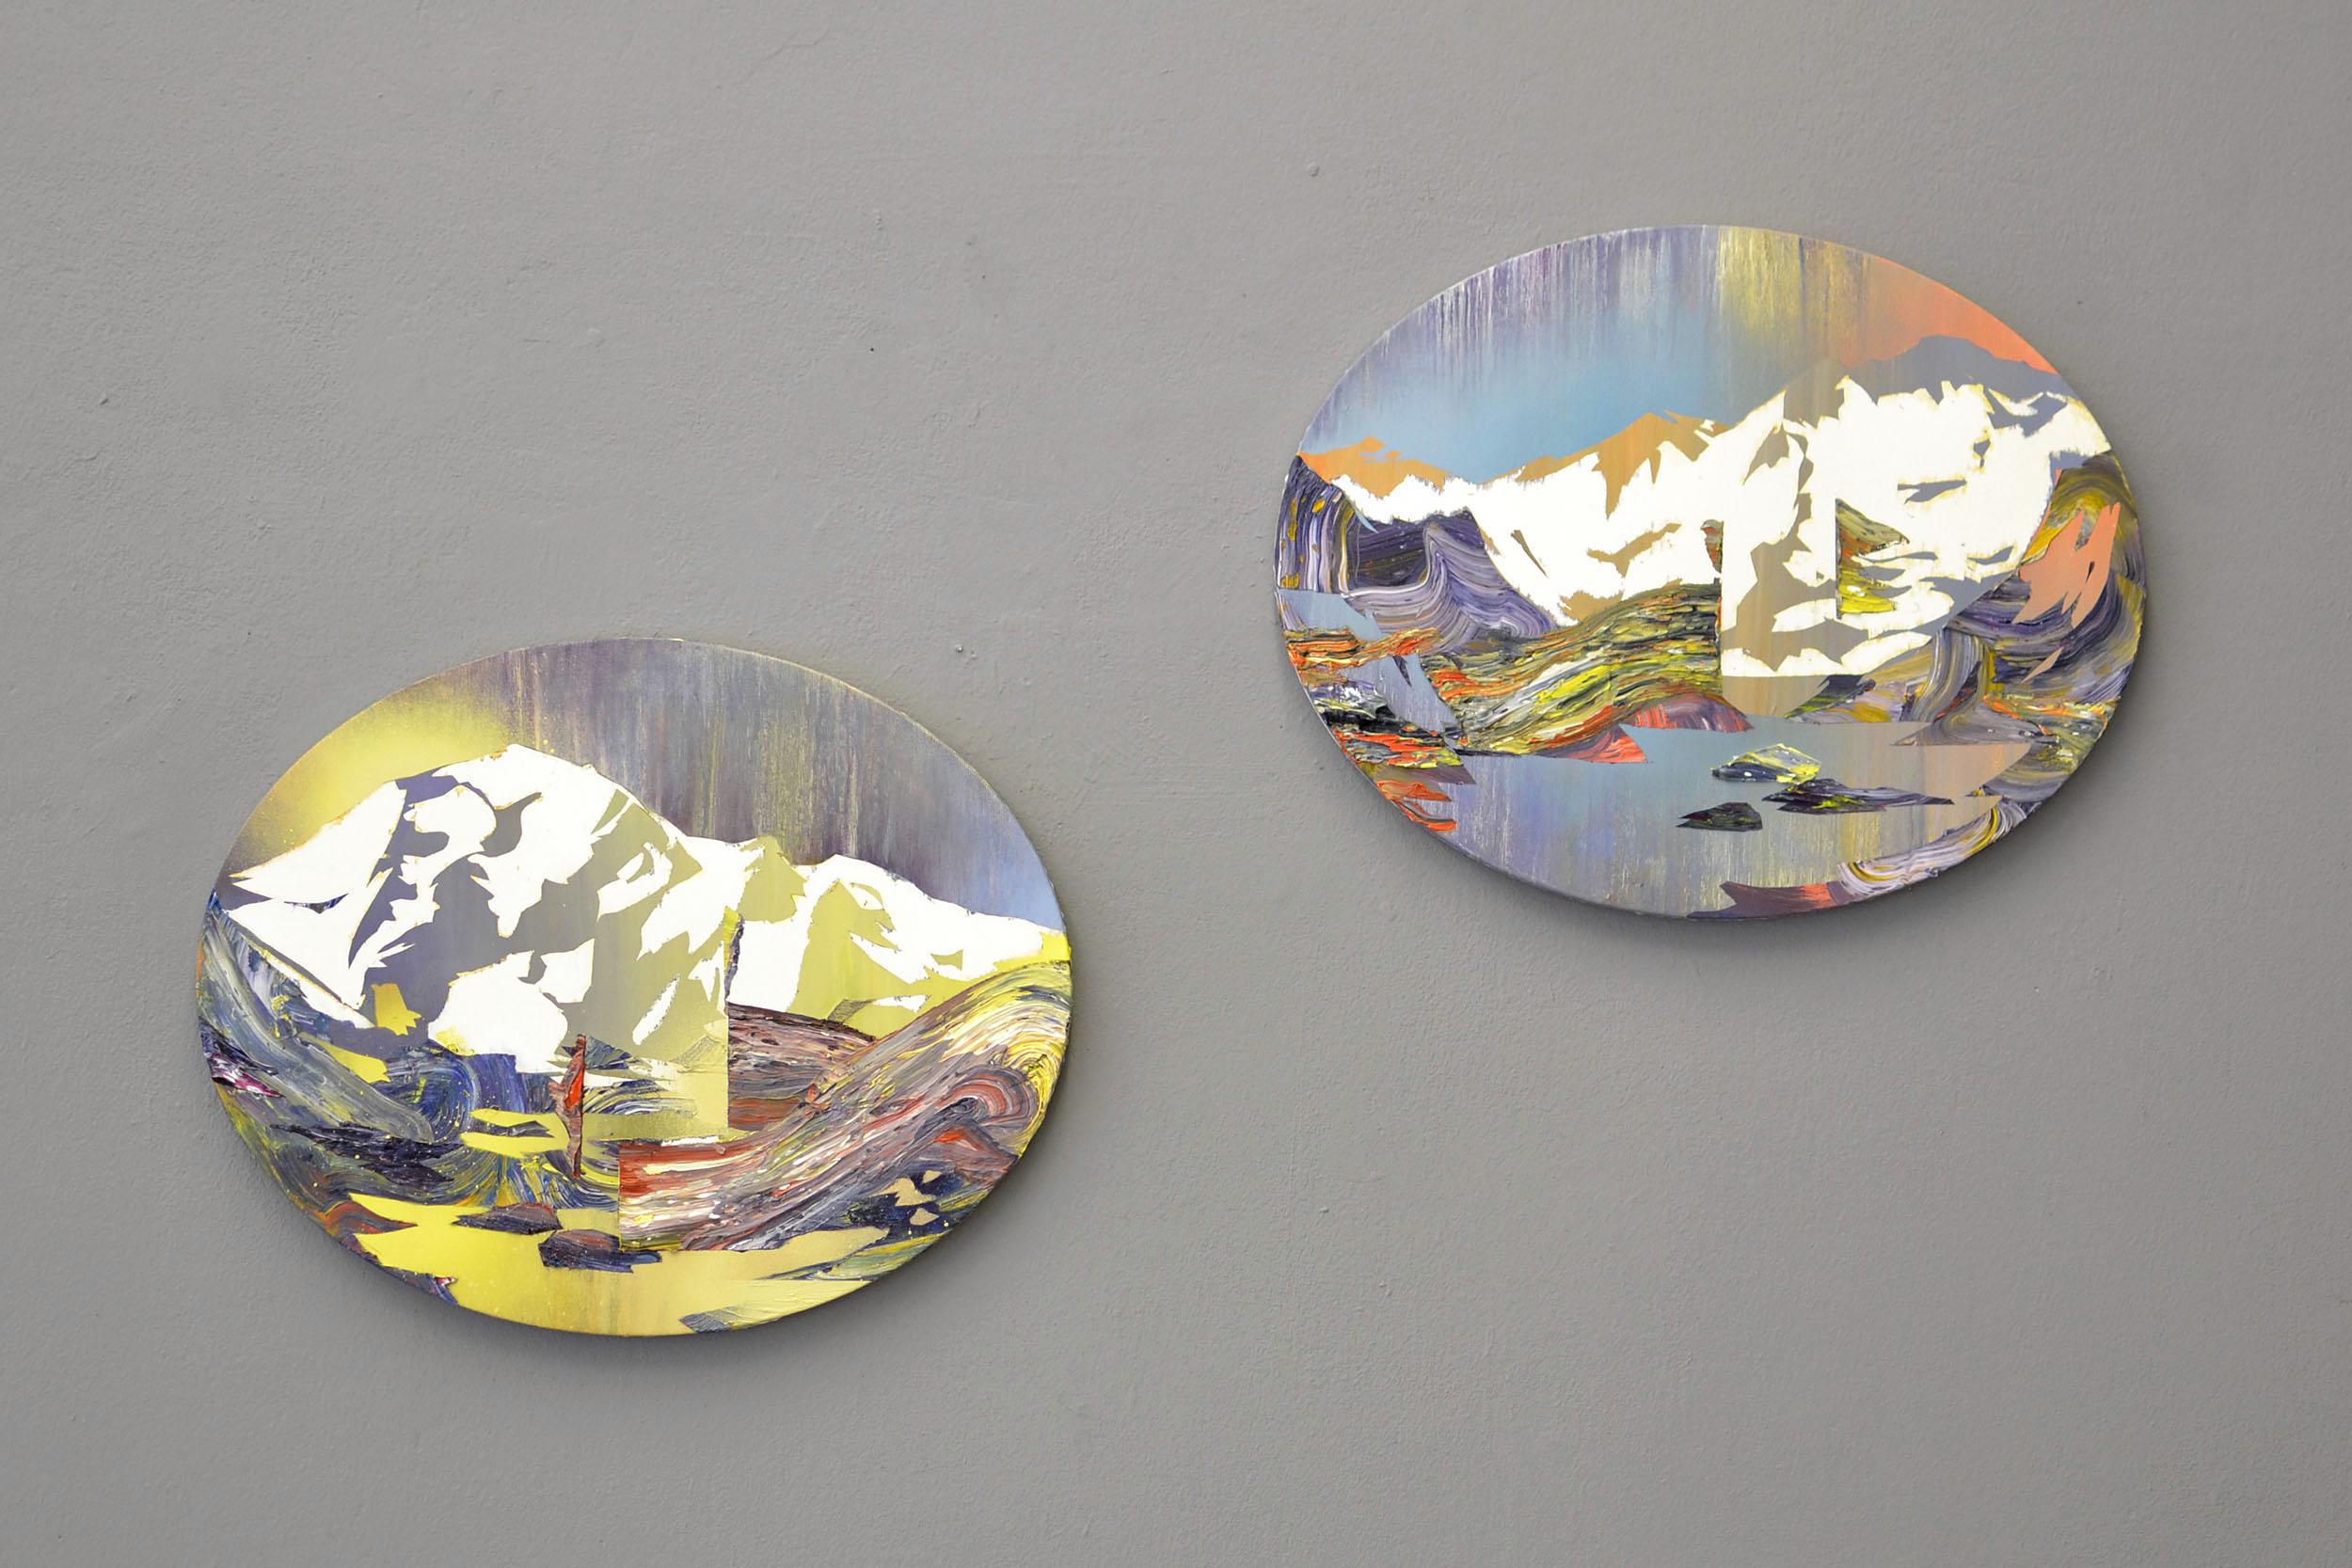 Ferner I und II  oil on canvas 40 x 50 cm, 2013